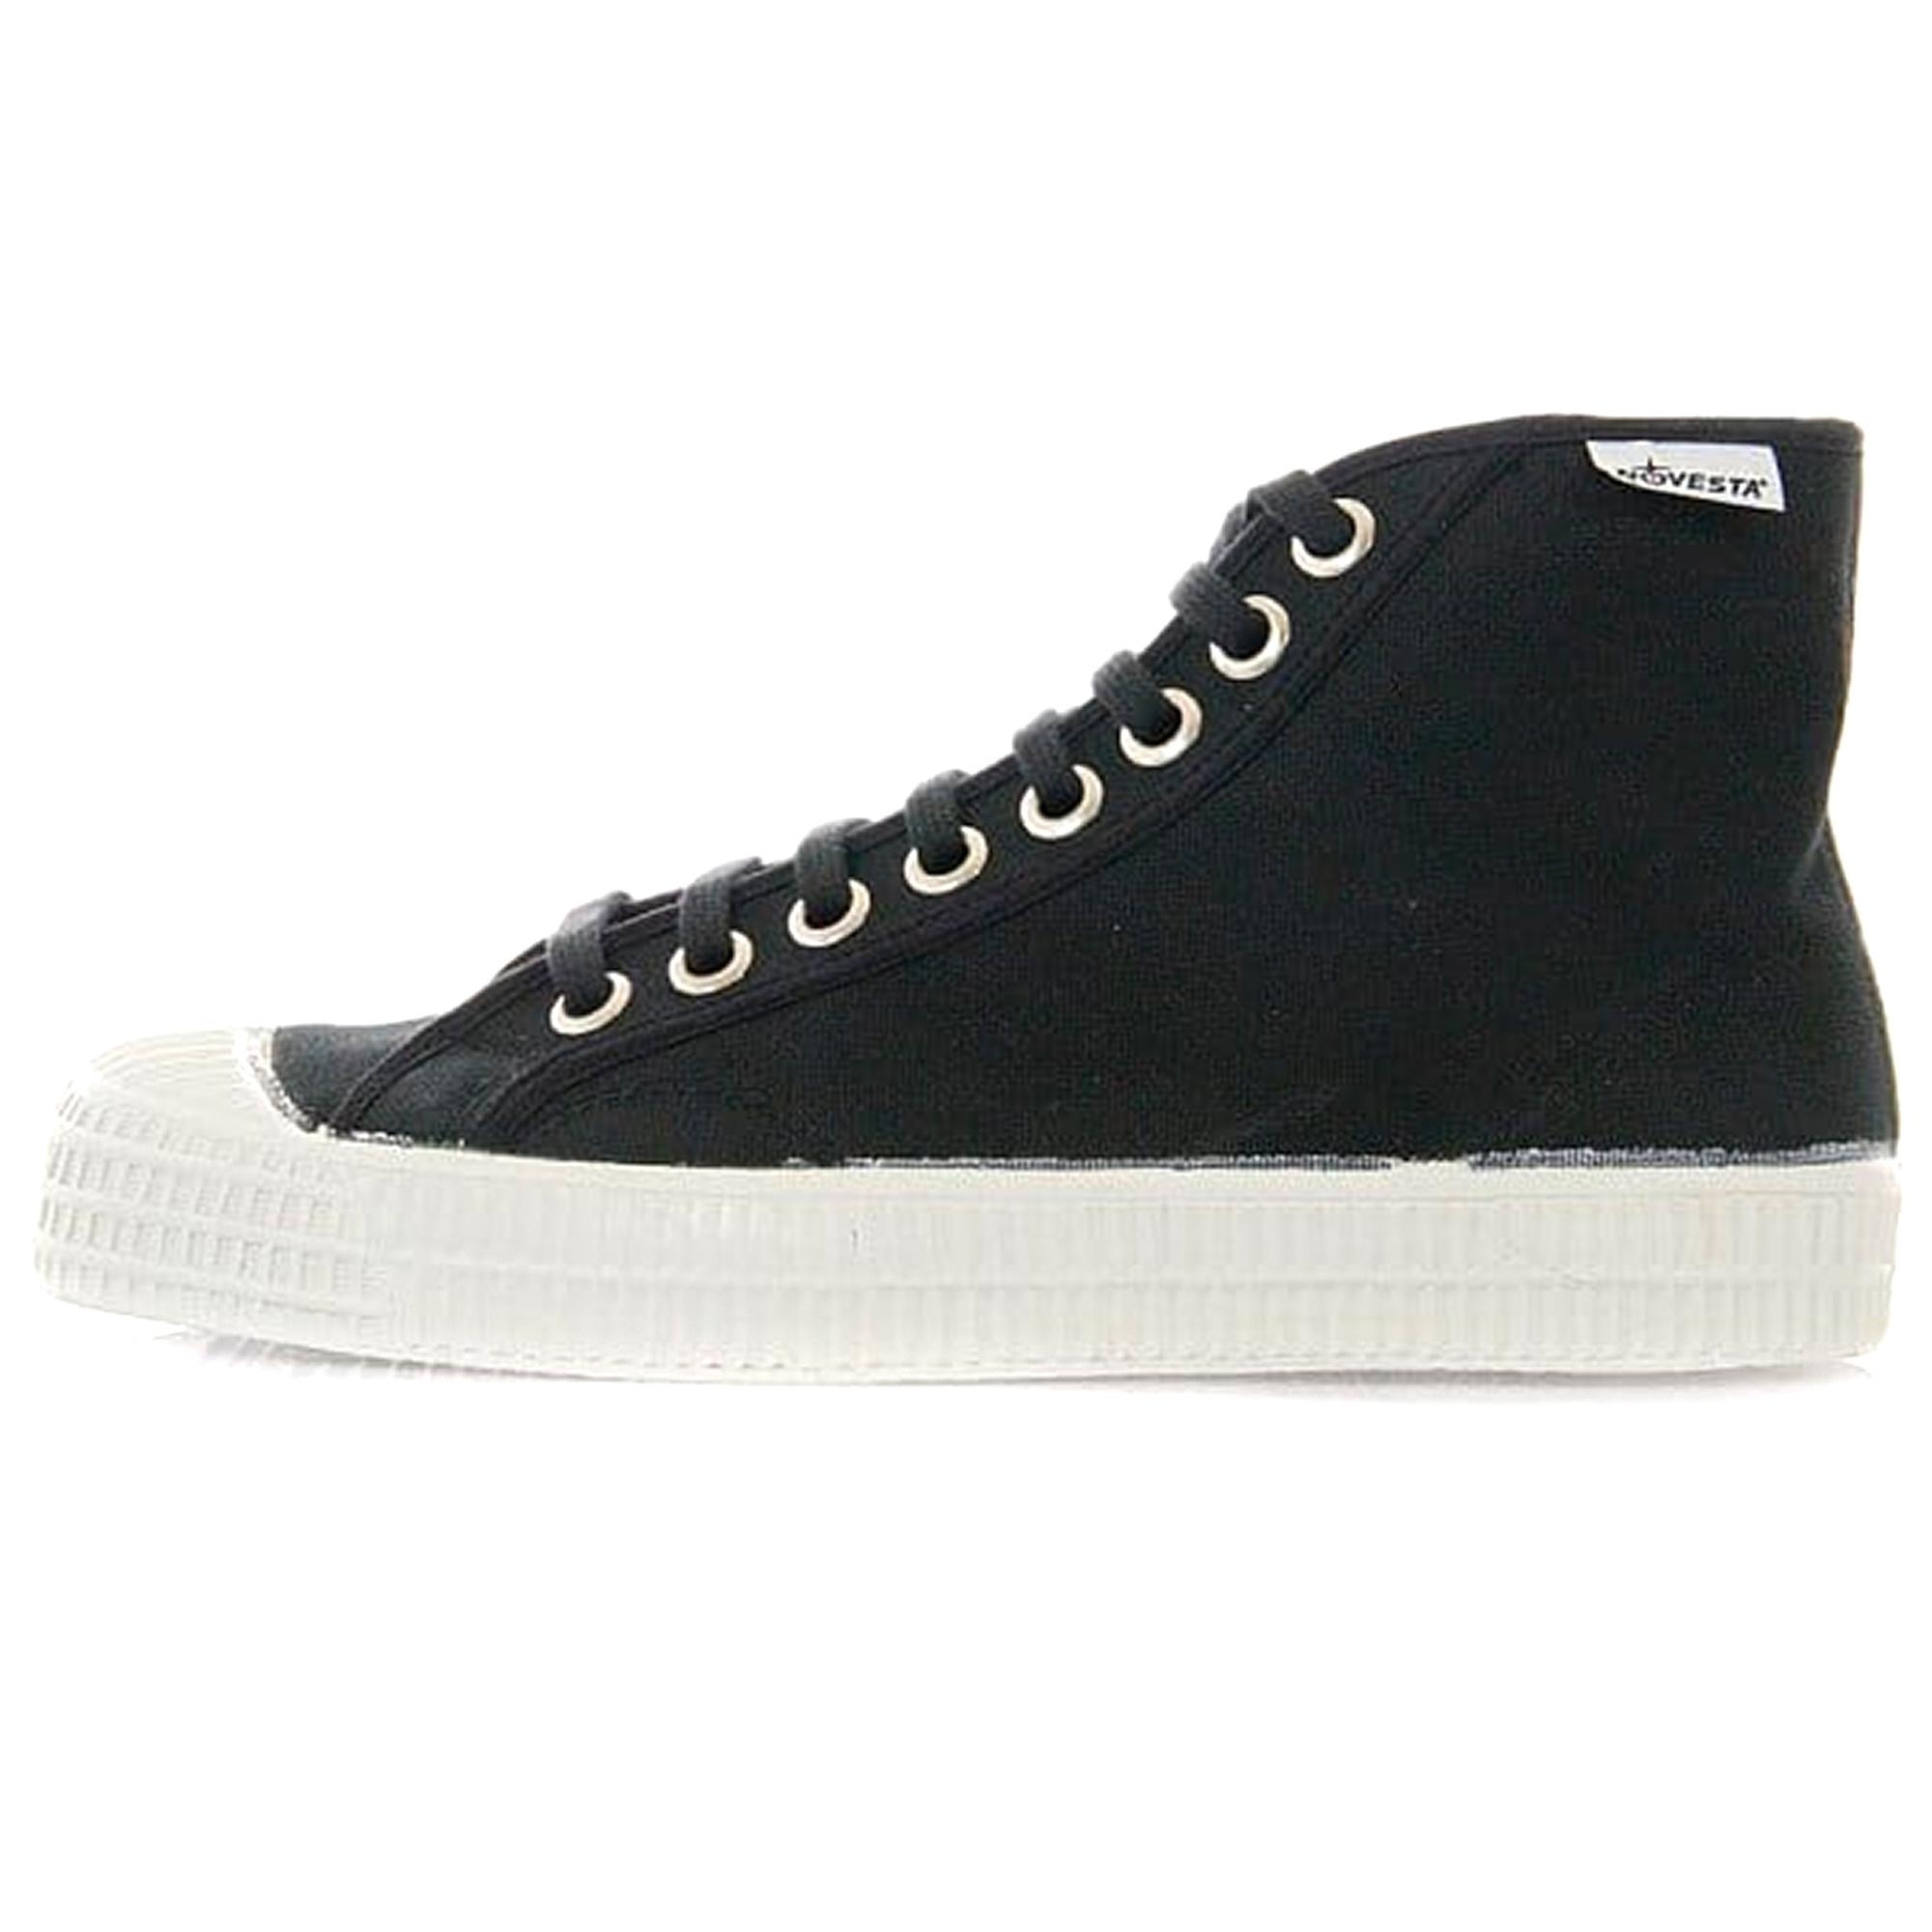 Star Dribble Black Hi Top Shoes